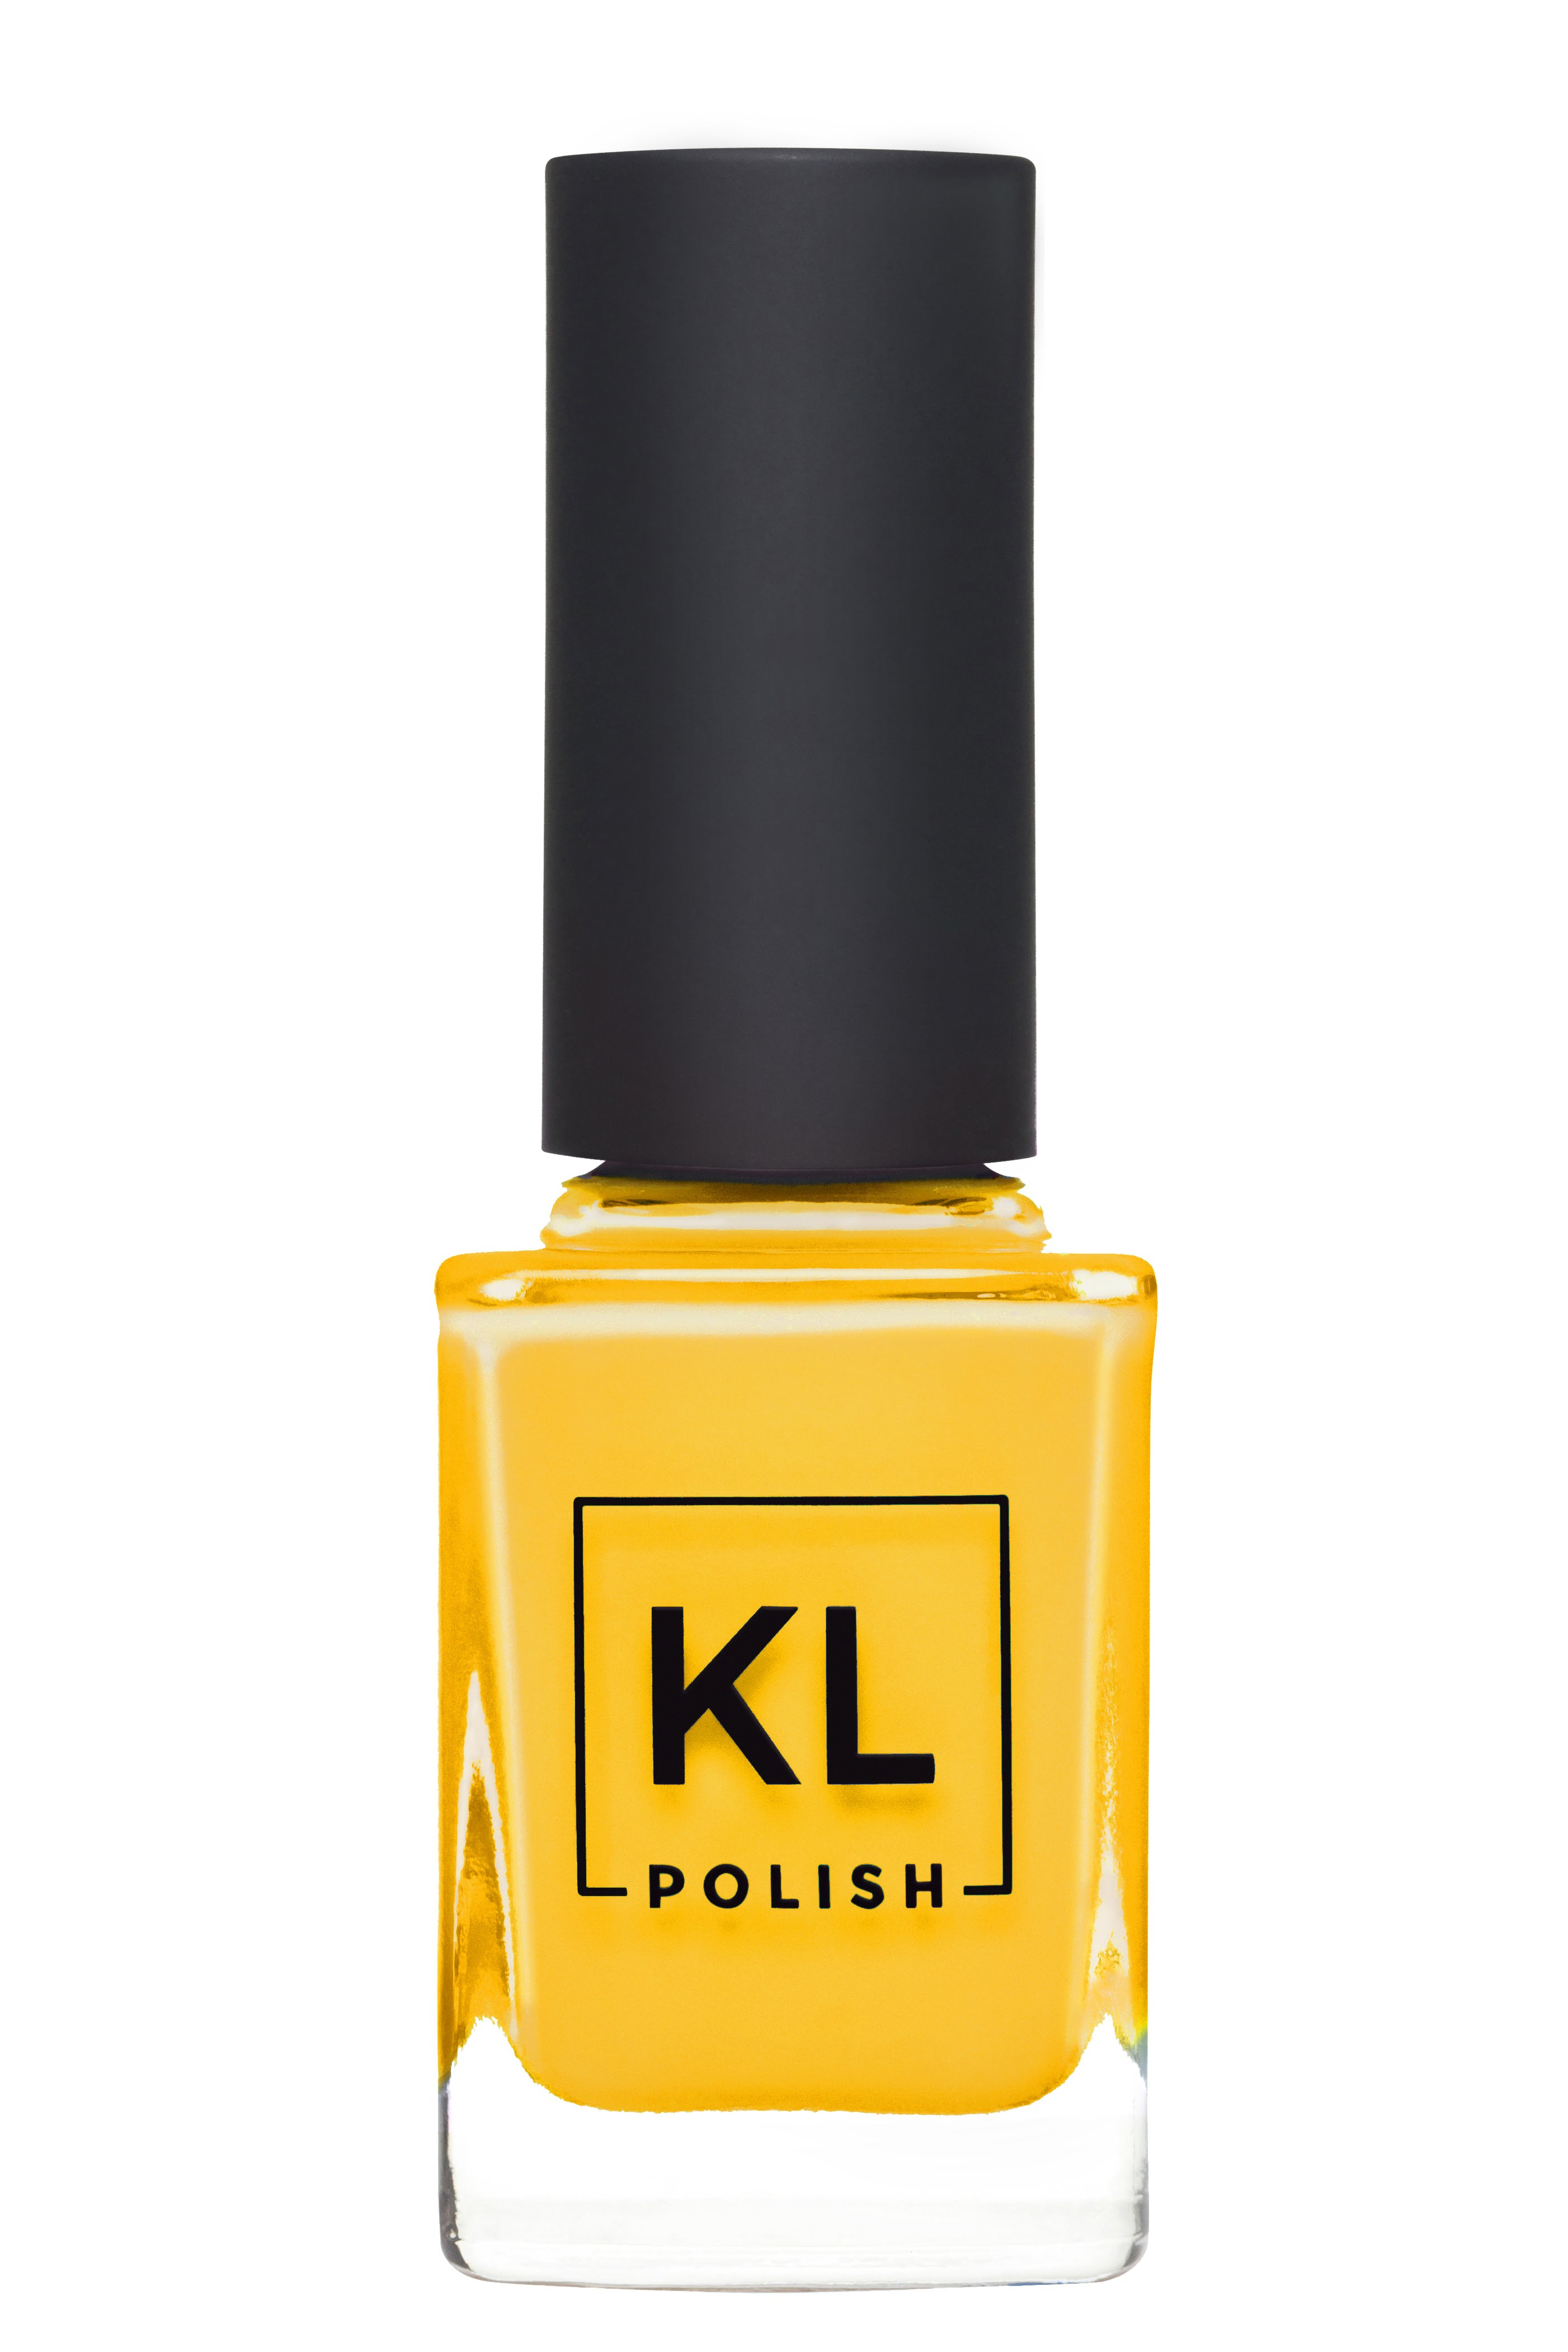 Kathleen Lights KL Polish Summer 2018